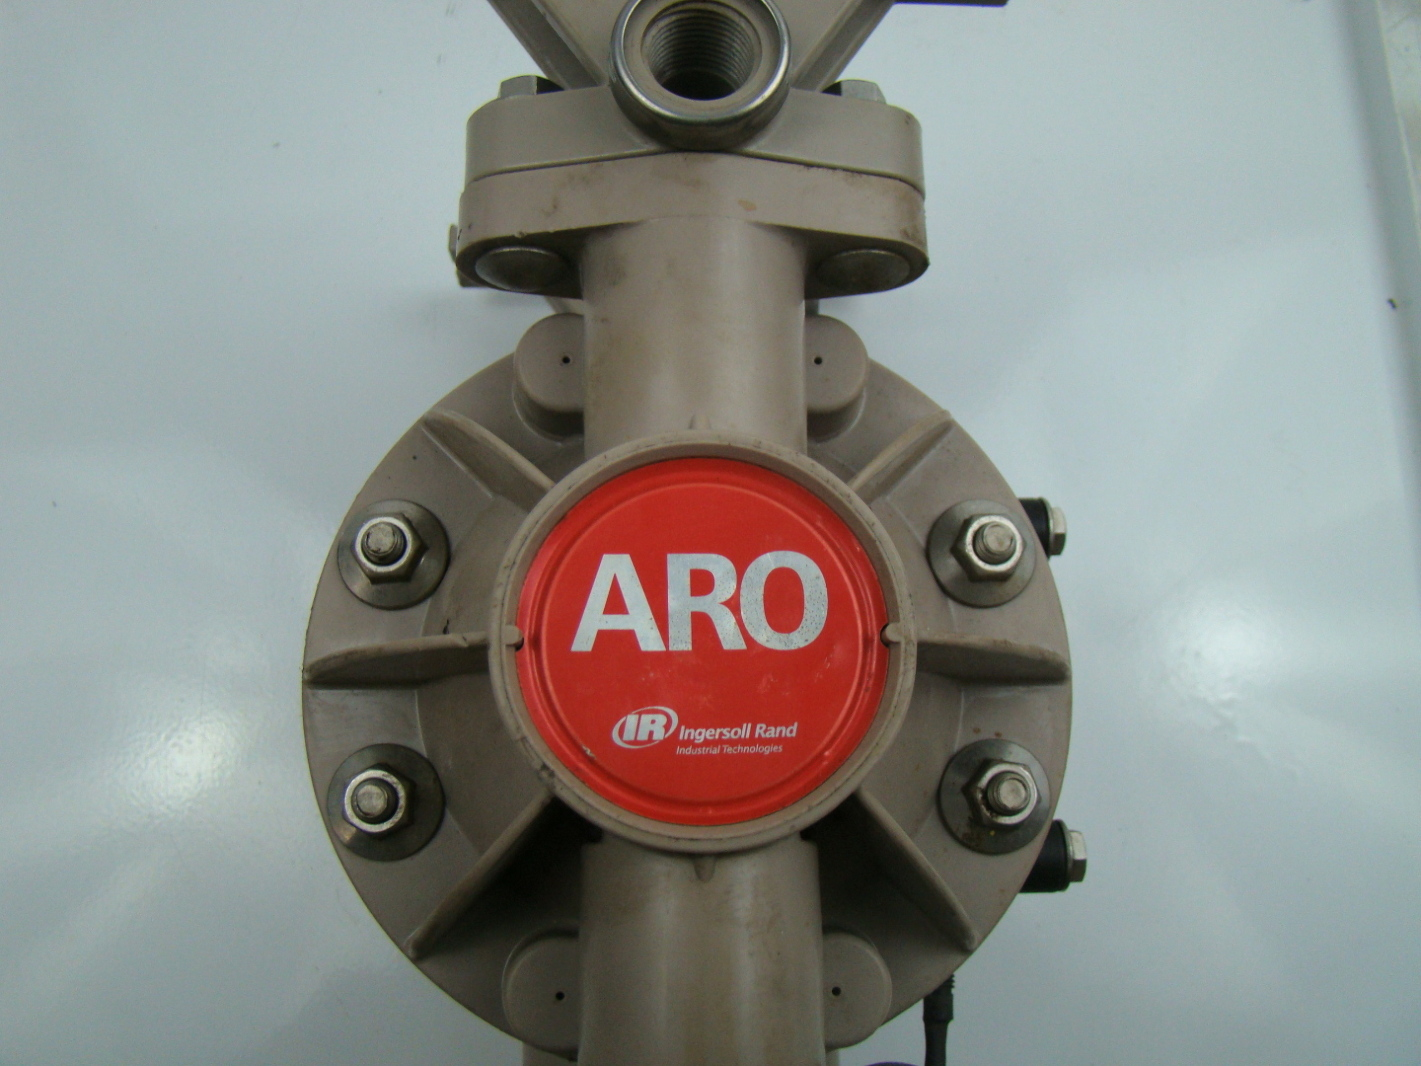 Ingersoll Rand Aro 1 2 034 Diaphragm Pump 66605j 3eb Ebay